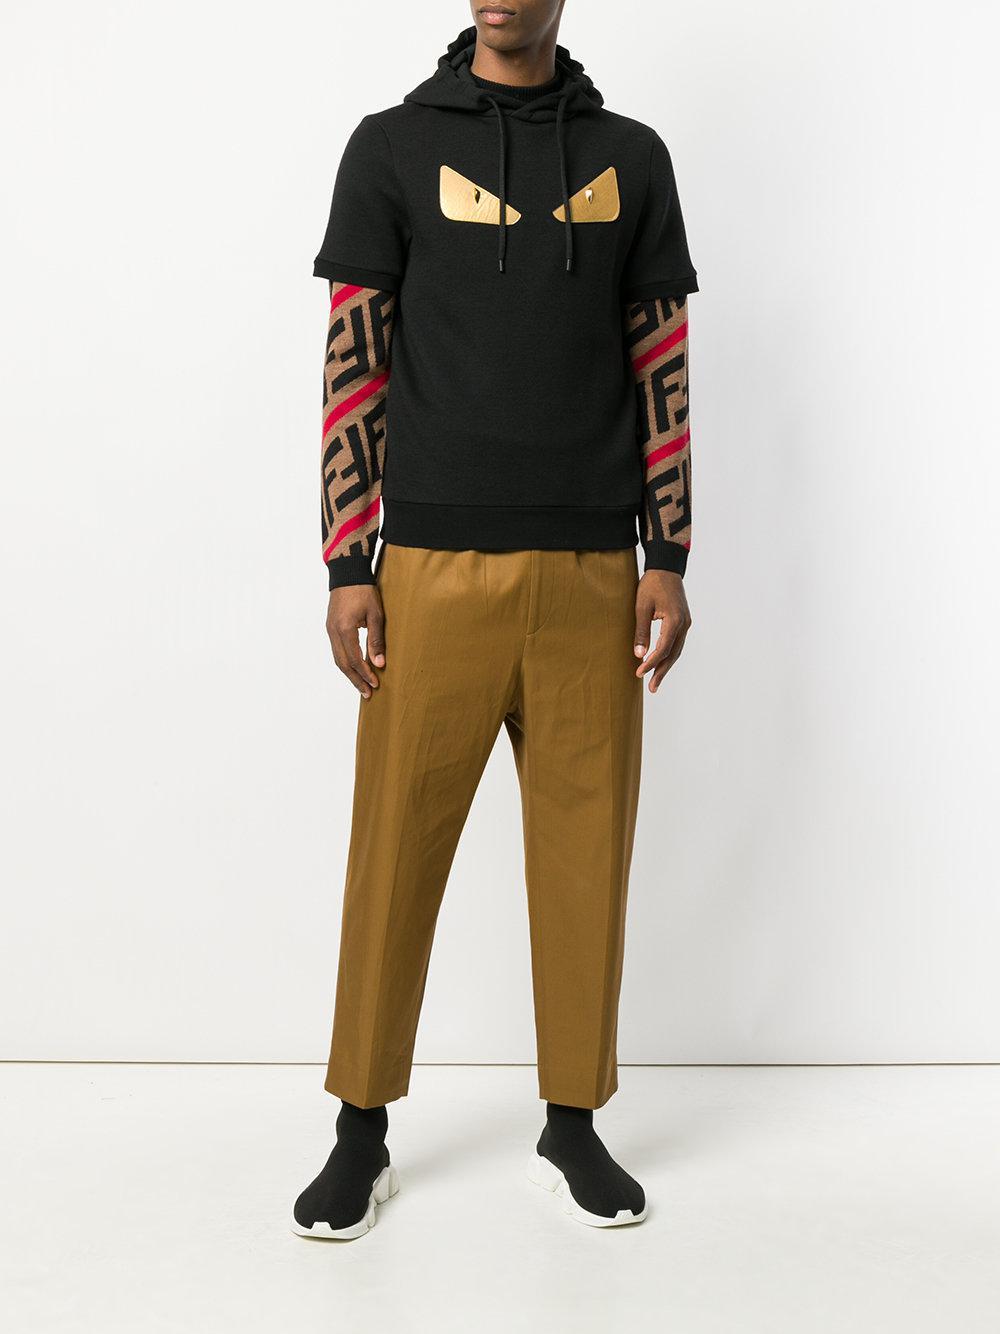 552a2644f53a Lyst - Fendi Bag Bugs Short Sleeve Hoodie in Black for Men